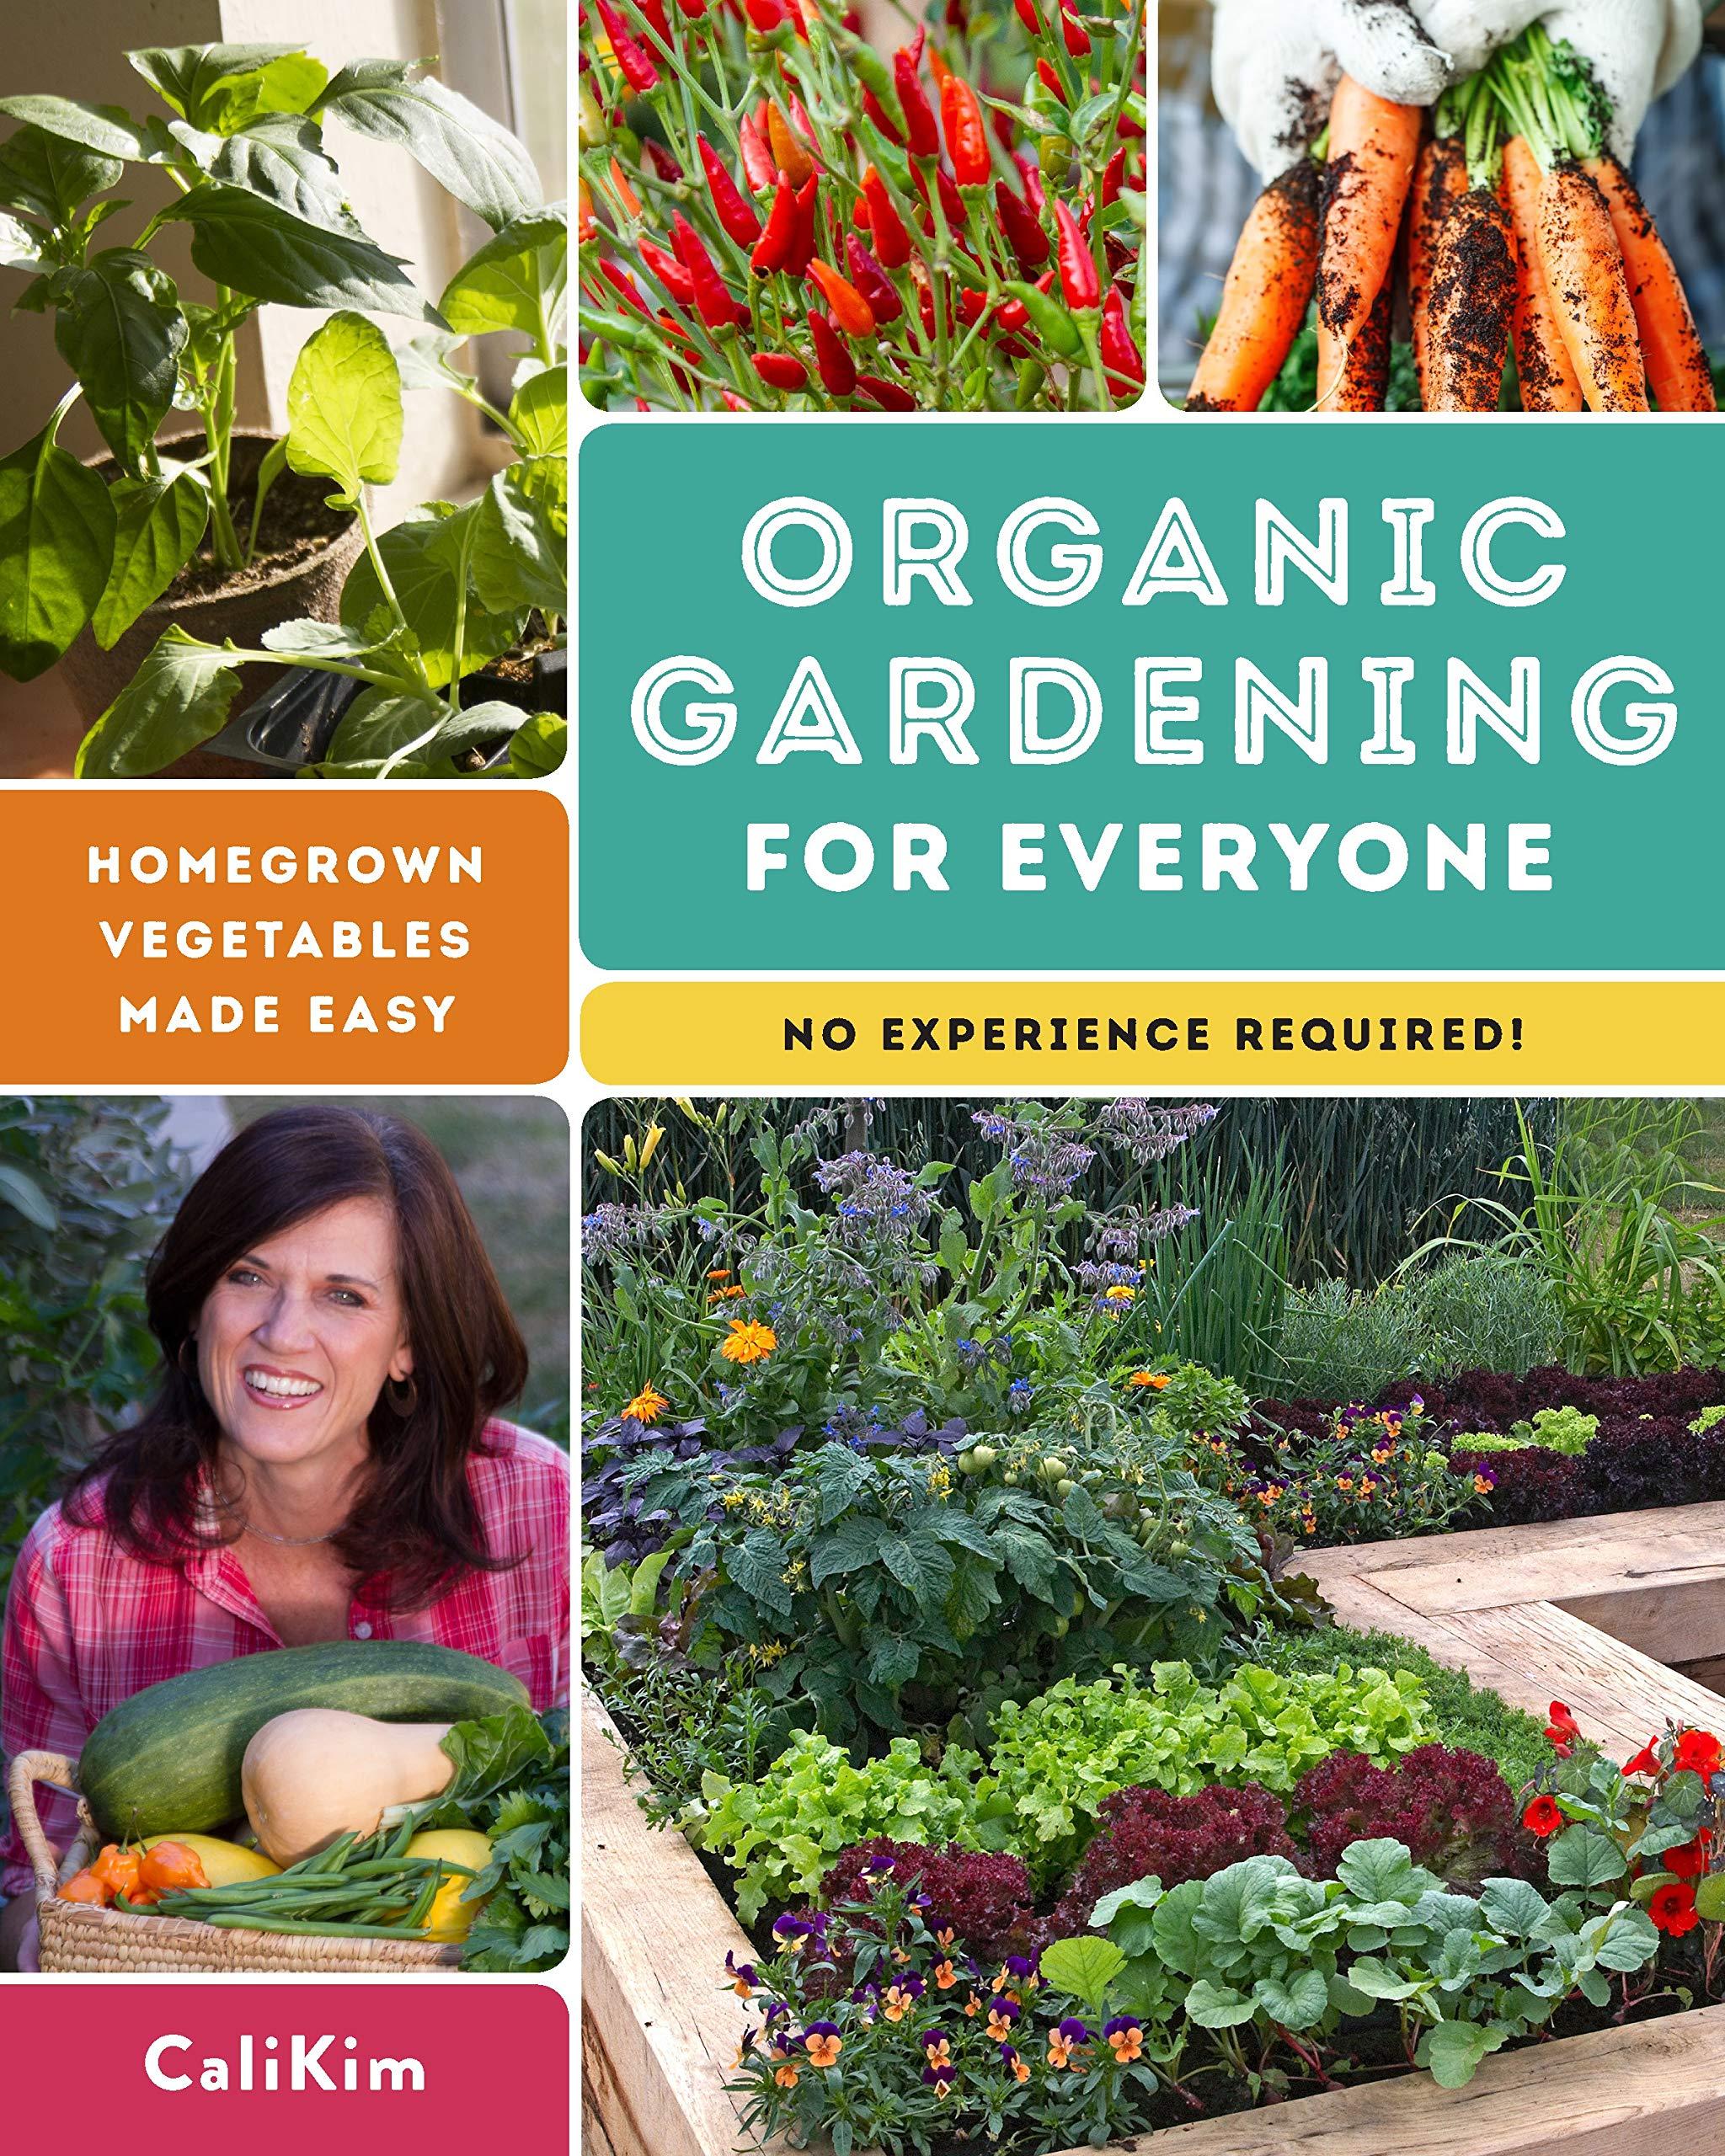 Organic Gardening for Everyone by Cali Kim